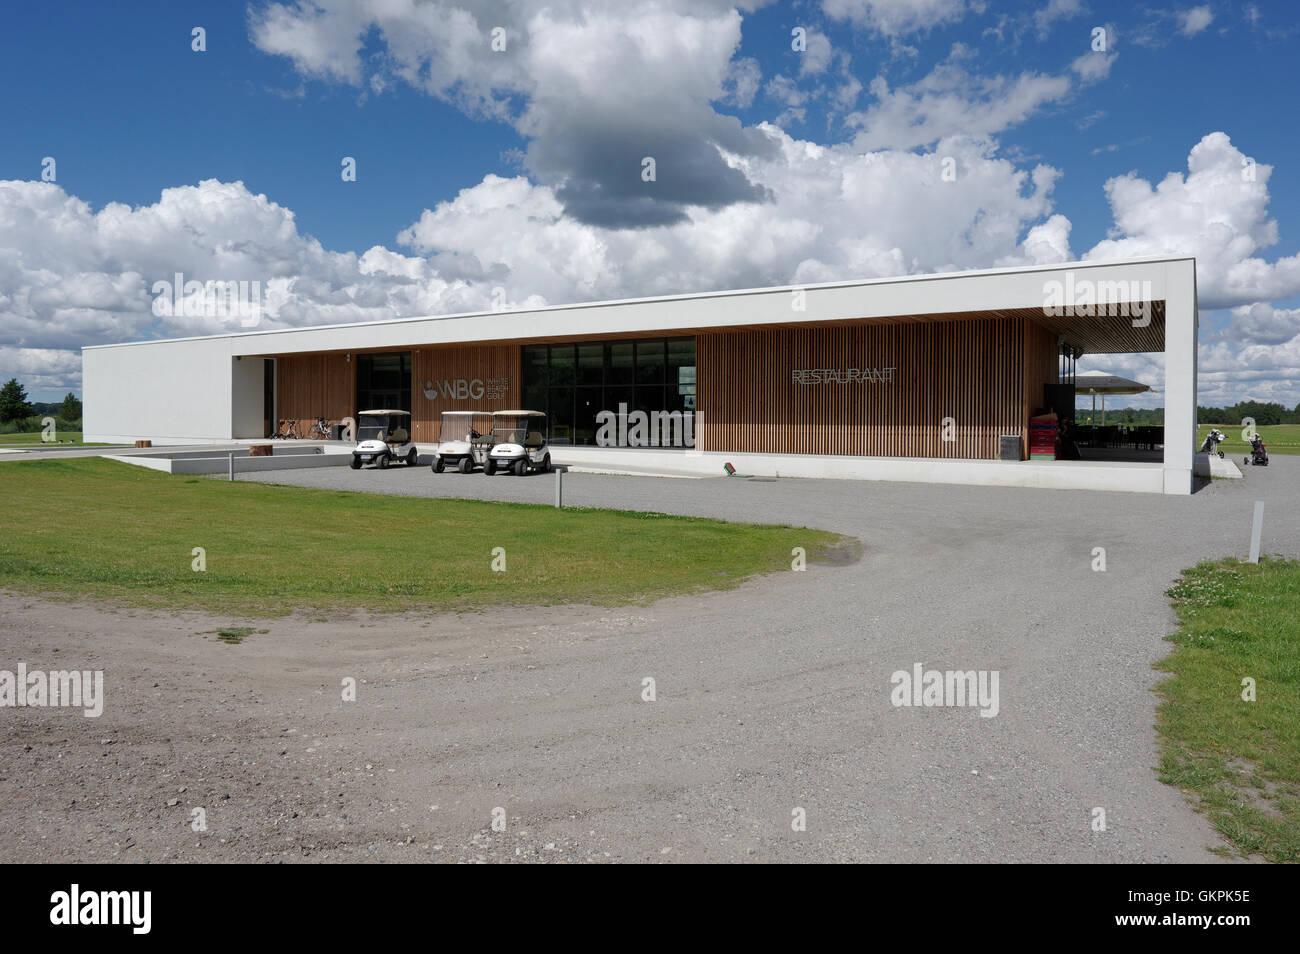 The White Beach Golf course designed architect Kosti Kuronen. Audru, Valgerand, Pärnu county, Estonia - Stock Image